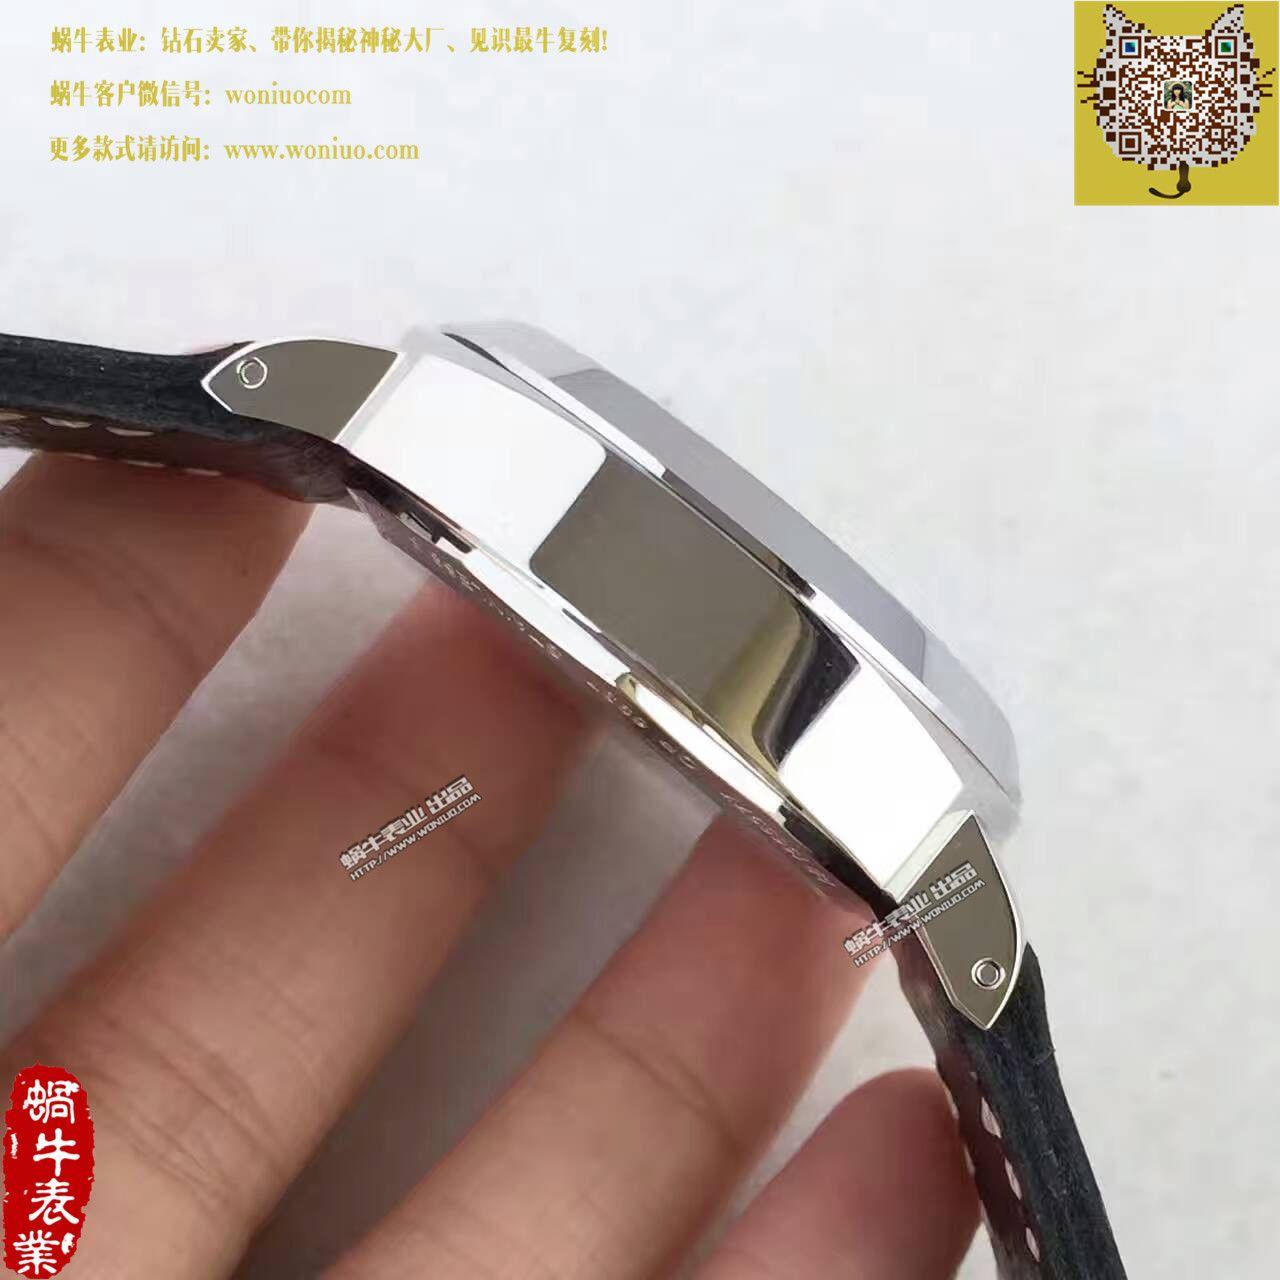 【KW厂1比1超A精仿手表】沛纳海LUMINOR系列PAM00510腕表 / PA015